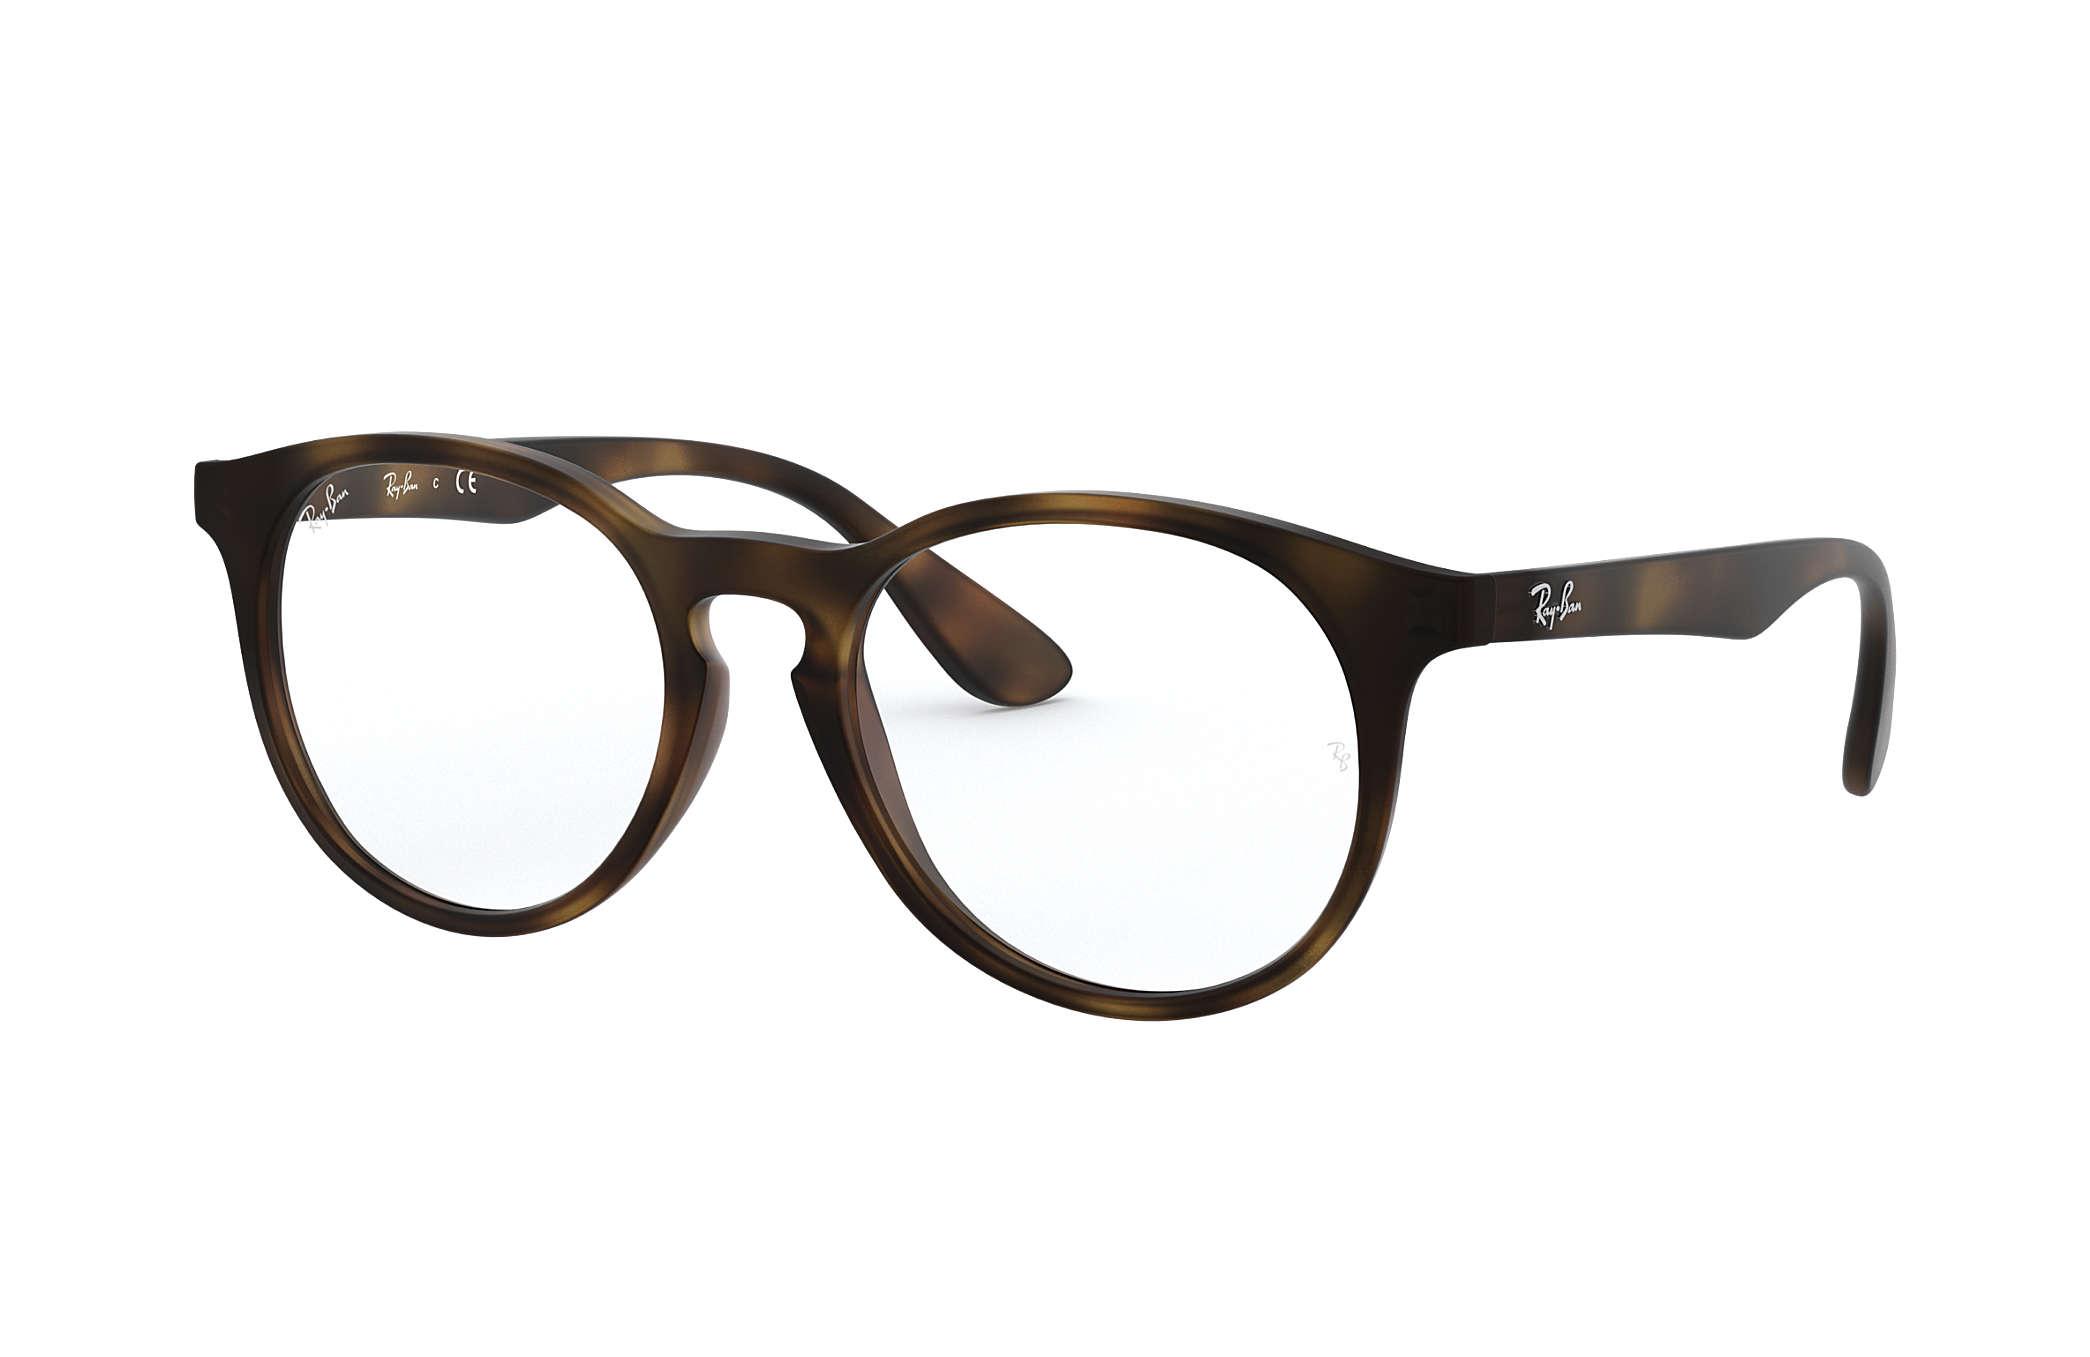 de6c0f4f8961 Kid's Glasses | Ray-Ban® USA